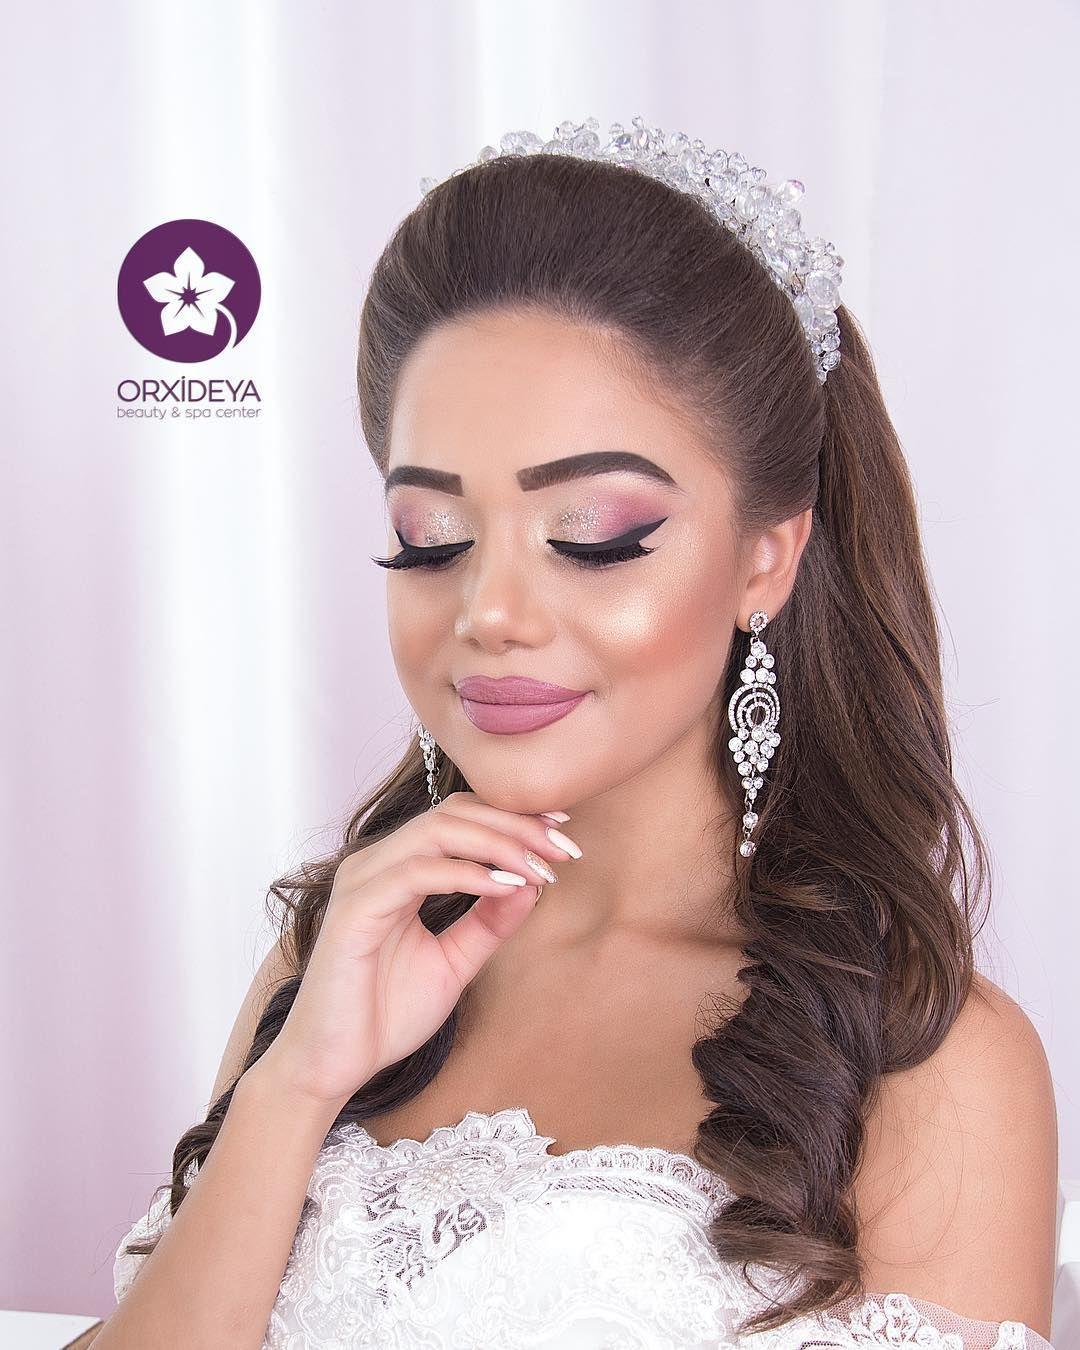 Axsaminiz Xeyir Olsun Sac Makiyaj By Me Feride Orxideya Orxideya Gozellikmerkezi Makeup Crown Jewelry Crown